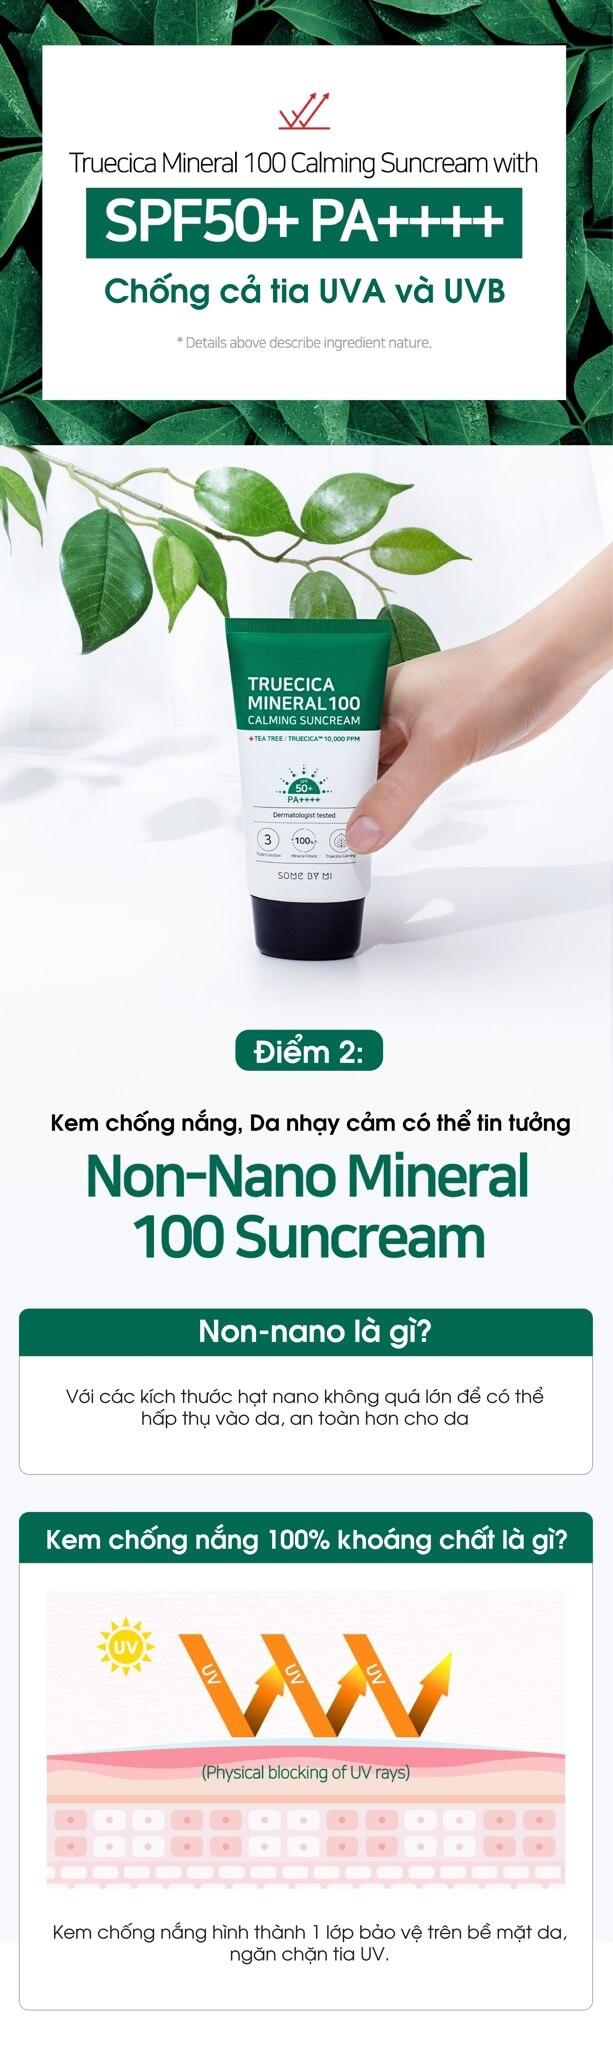 Some By Mi Truecica Mineral 100 Calming Suncream